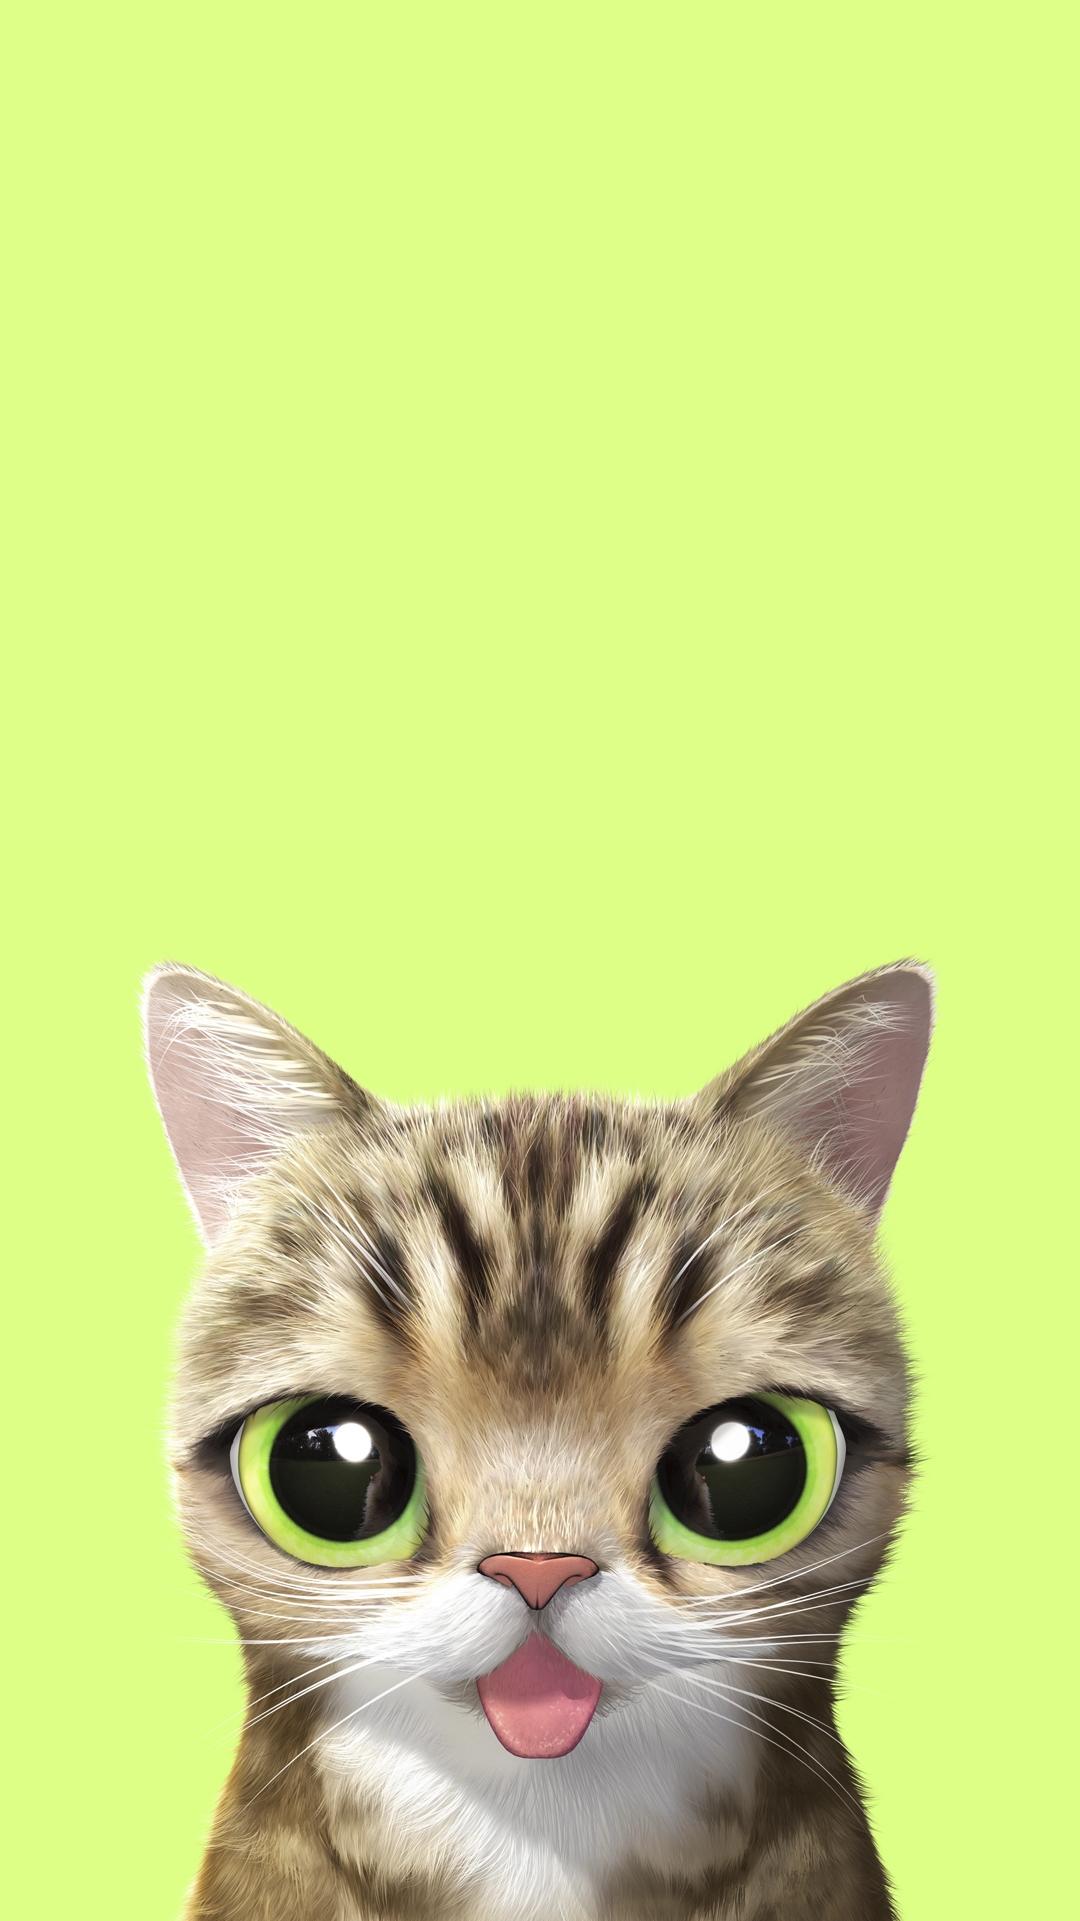 Обои на телефон котята красивые (15)